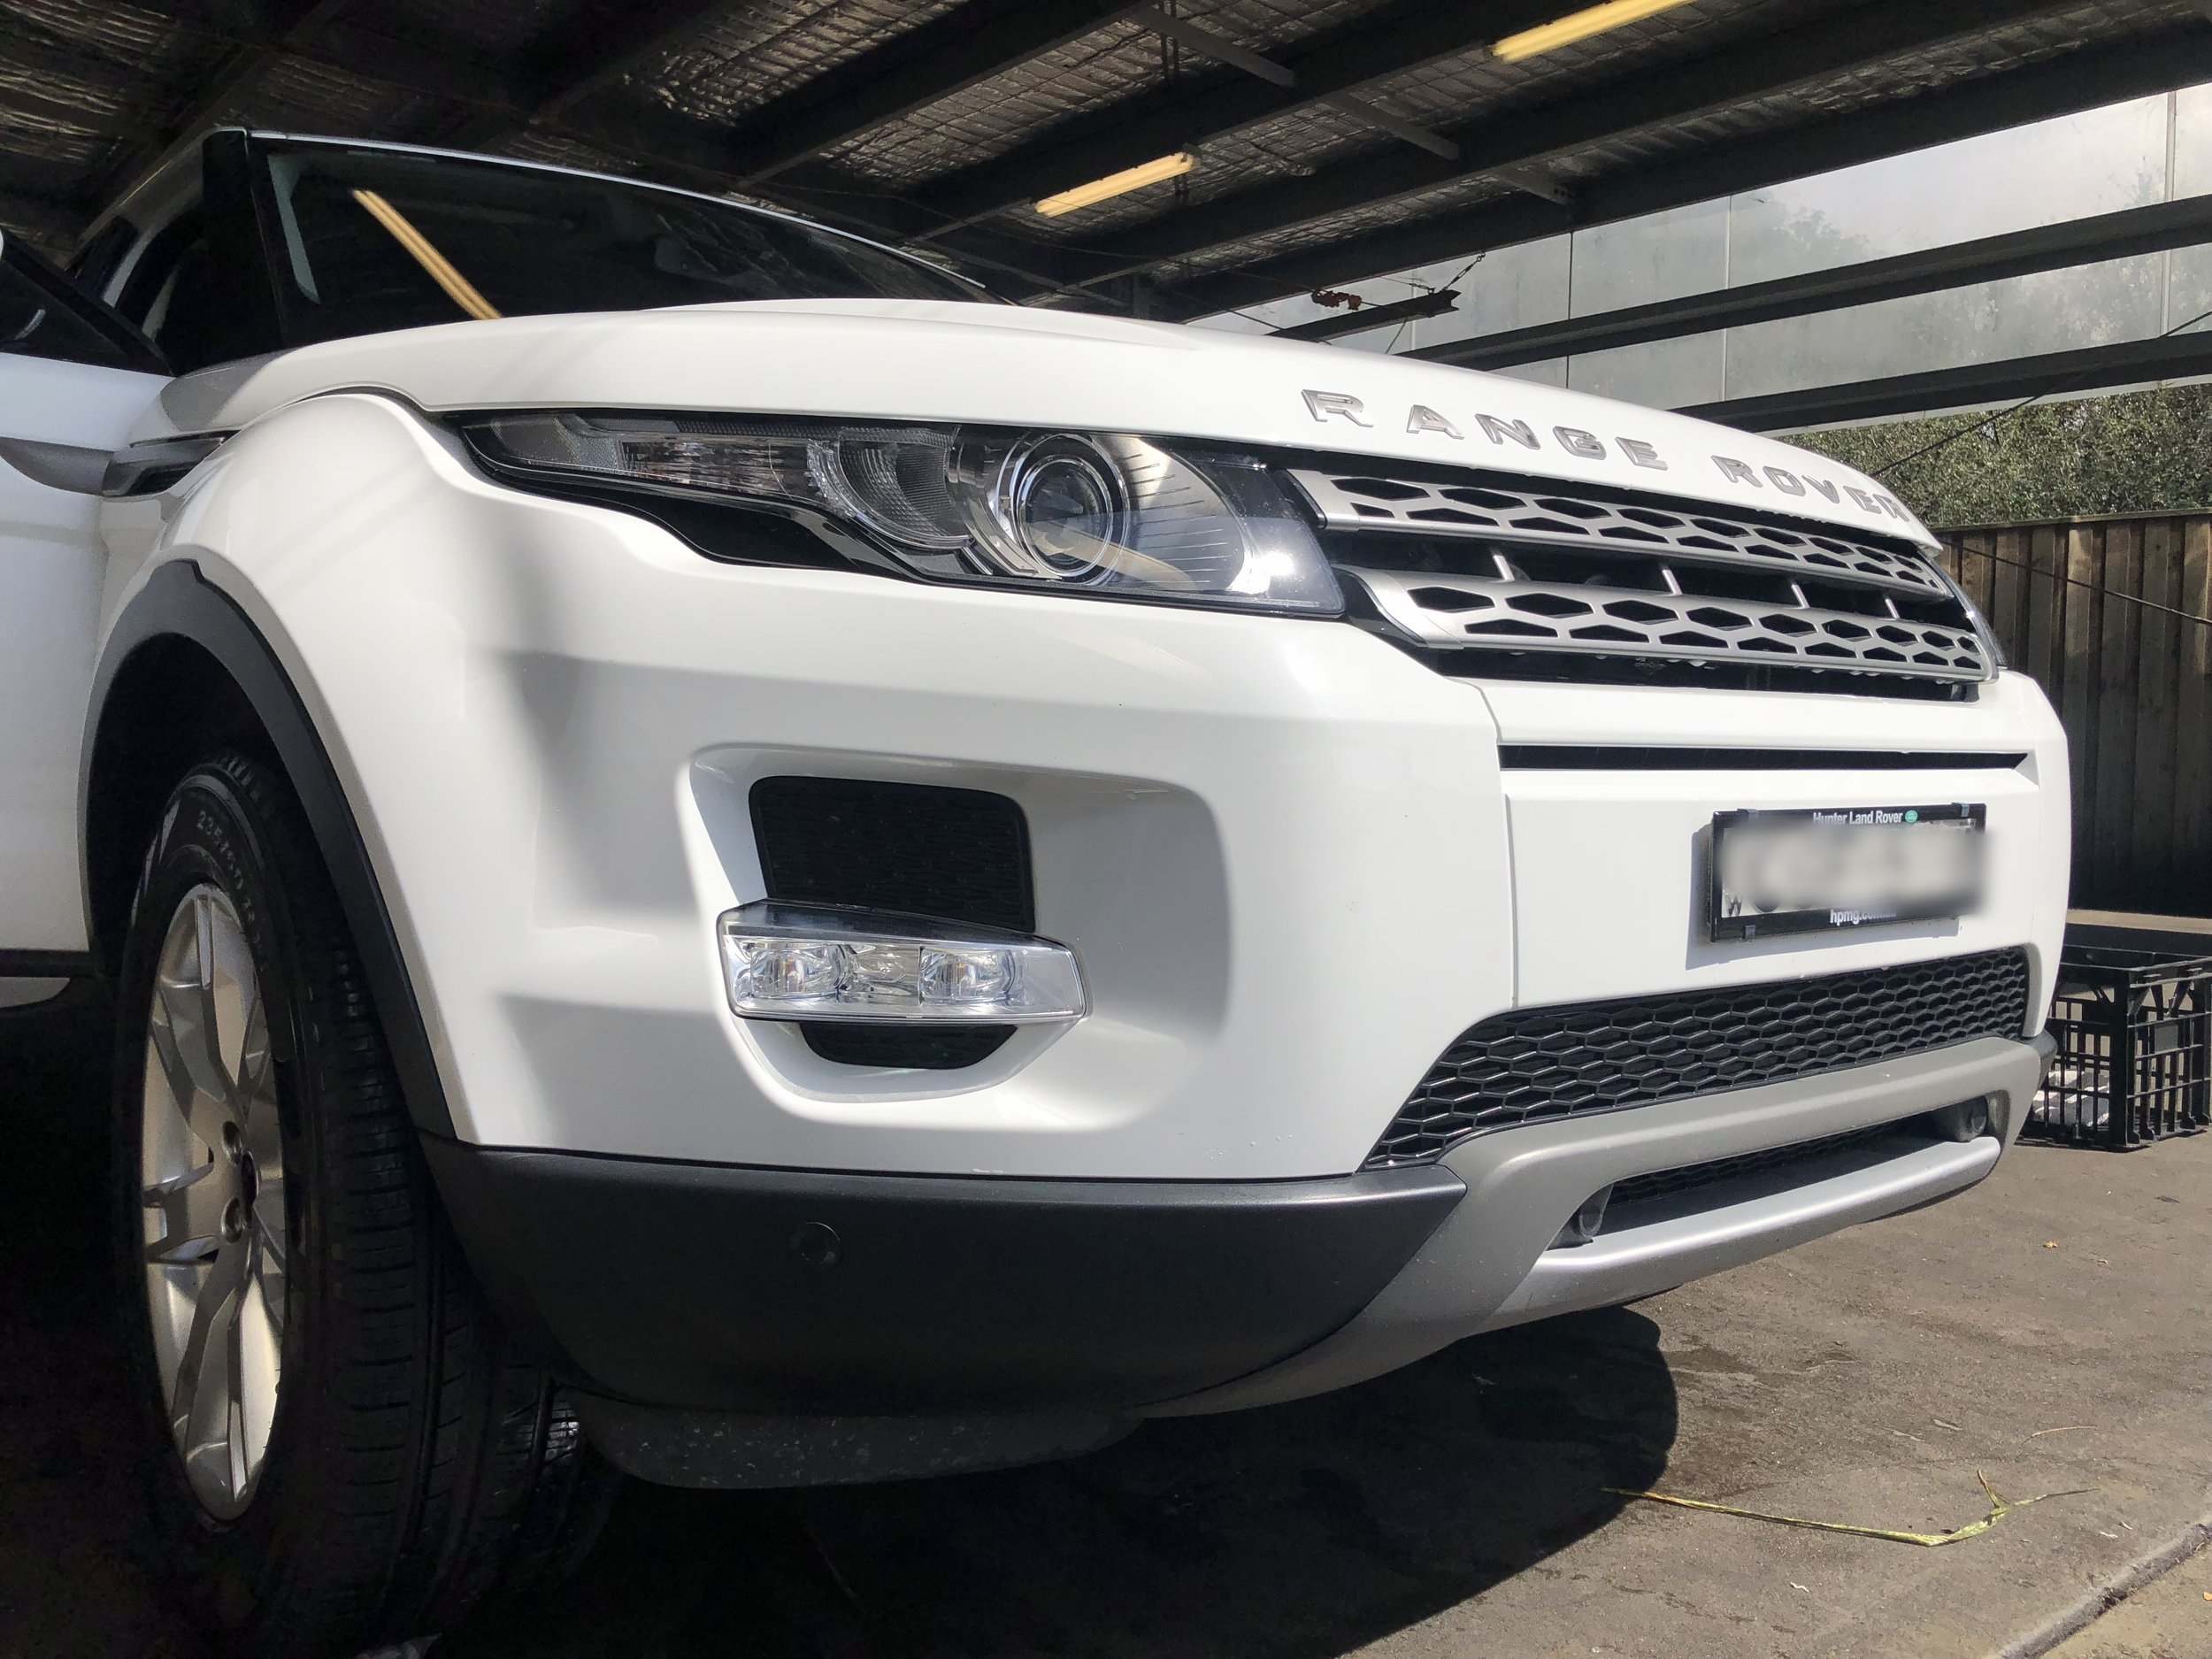 VIP Car Wash Newcastle